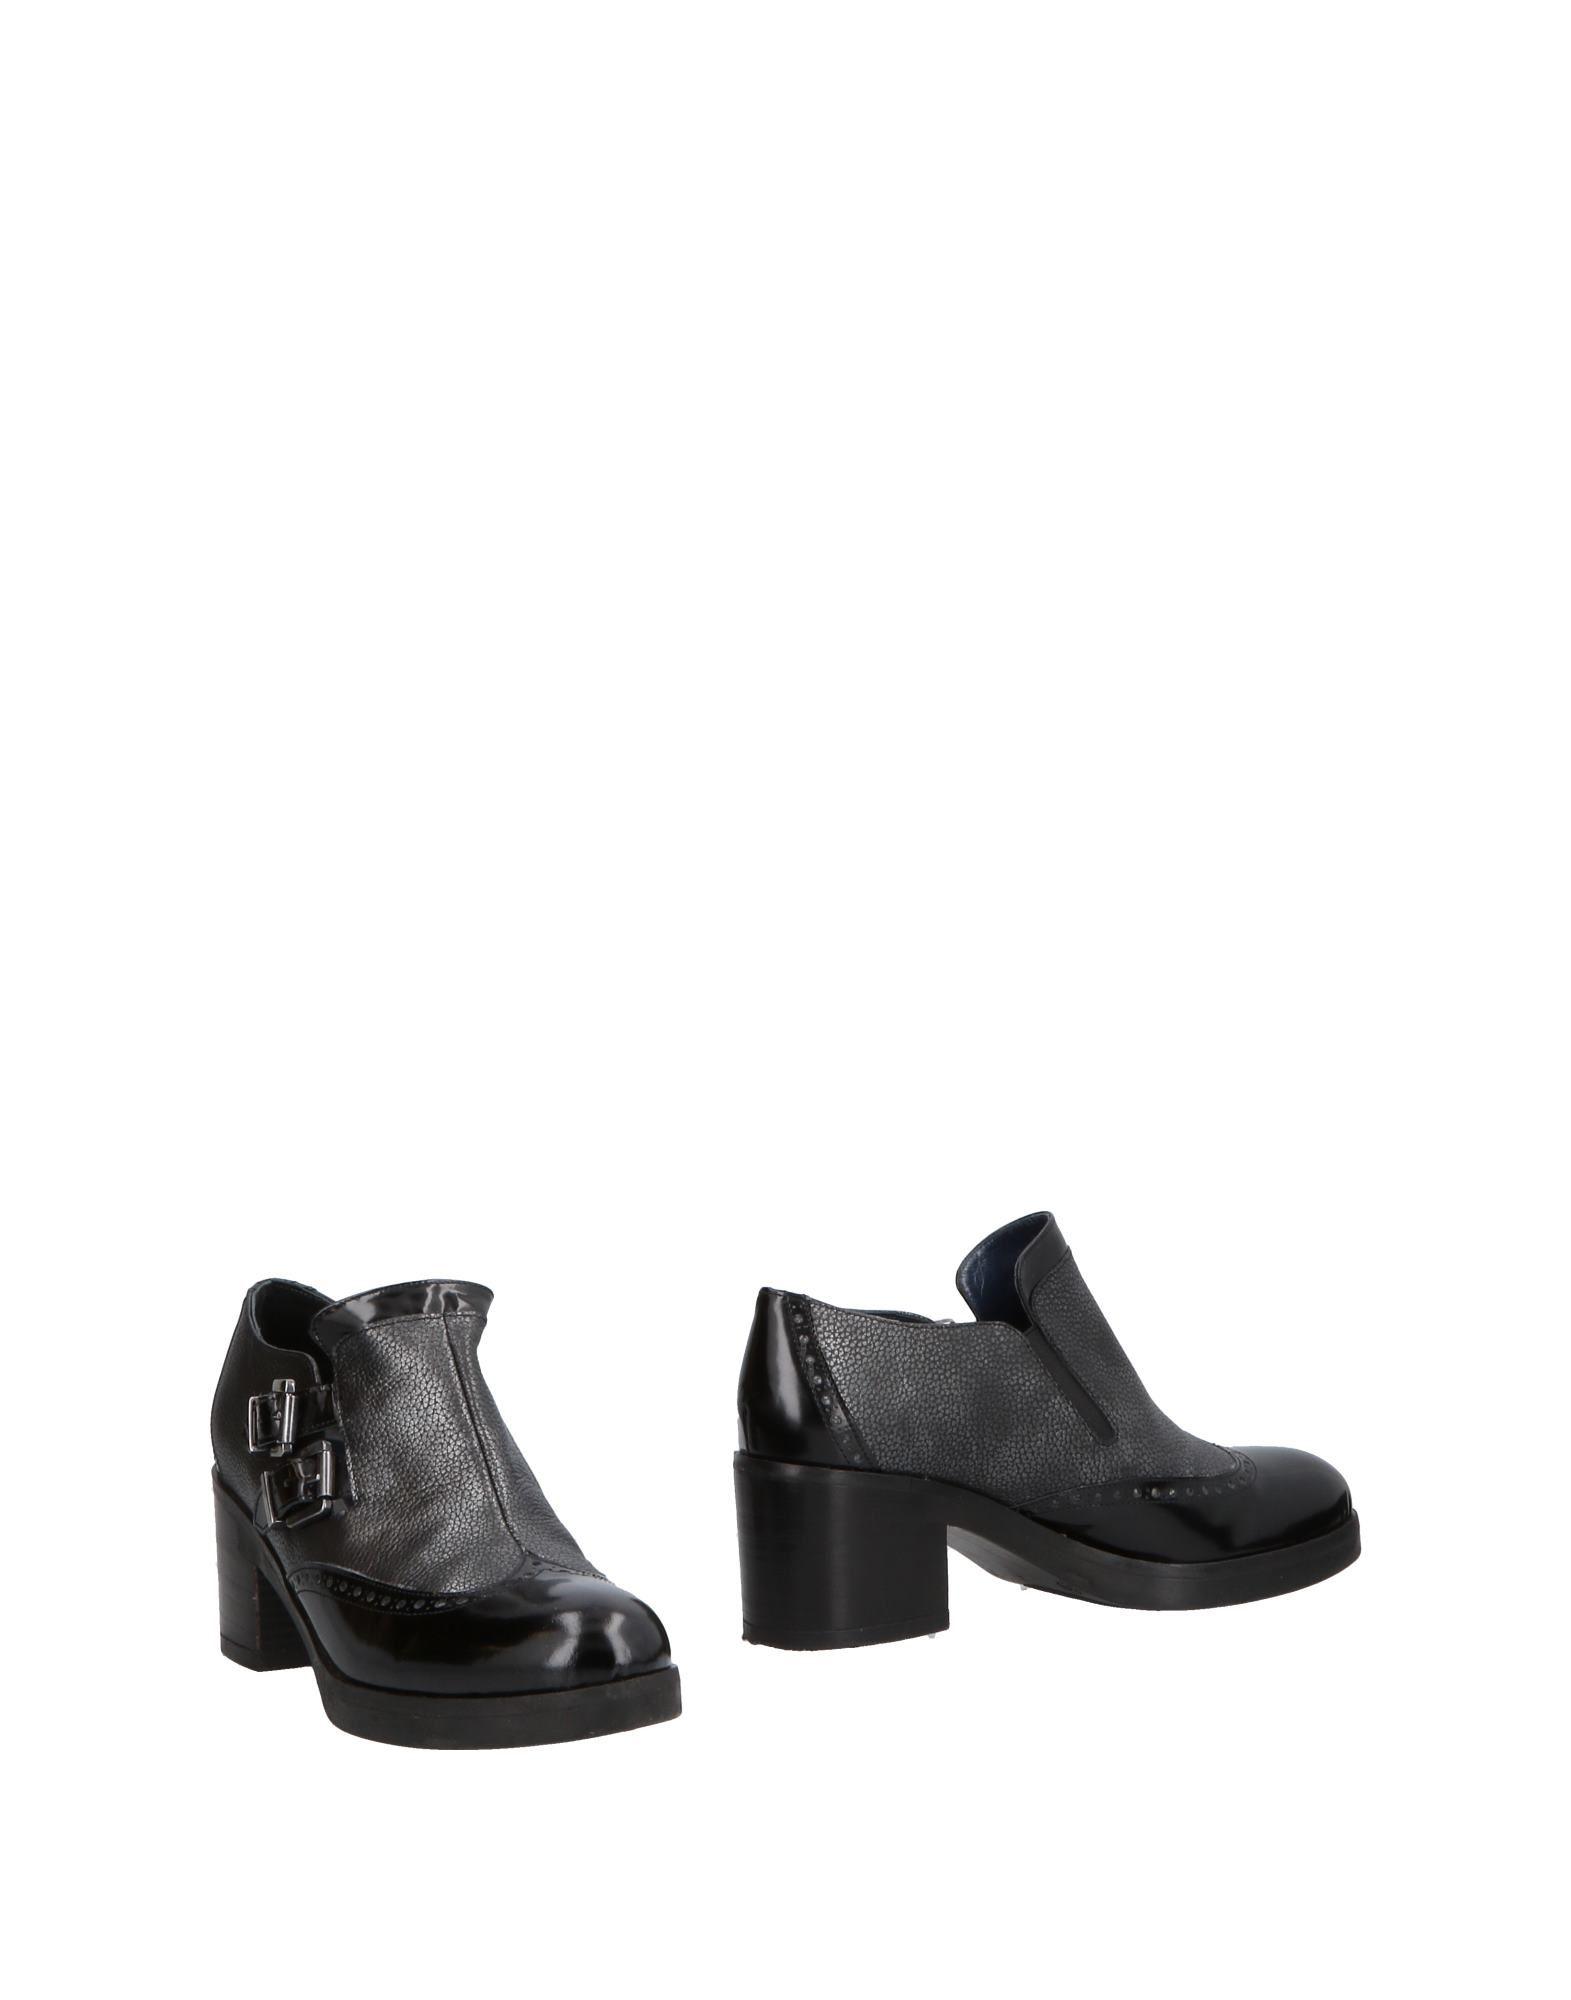 Andrea Pinto Stiefelette Damen  Schuhe 11503739JA Gute Qualität beliebte Schuhe  0be867